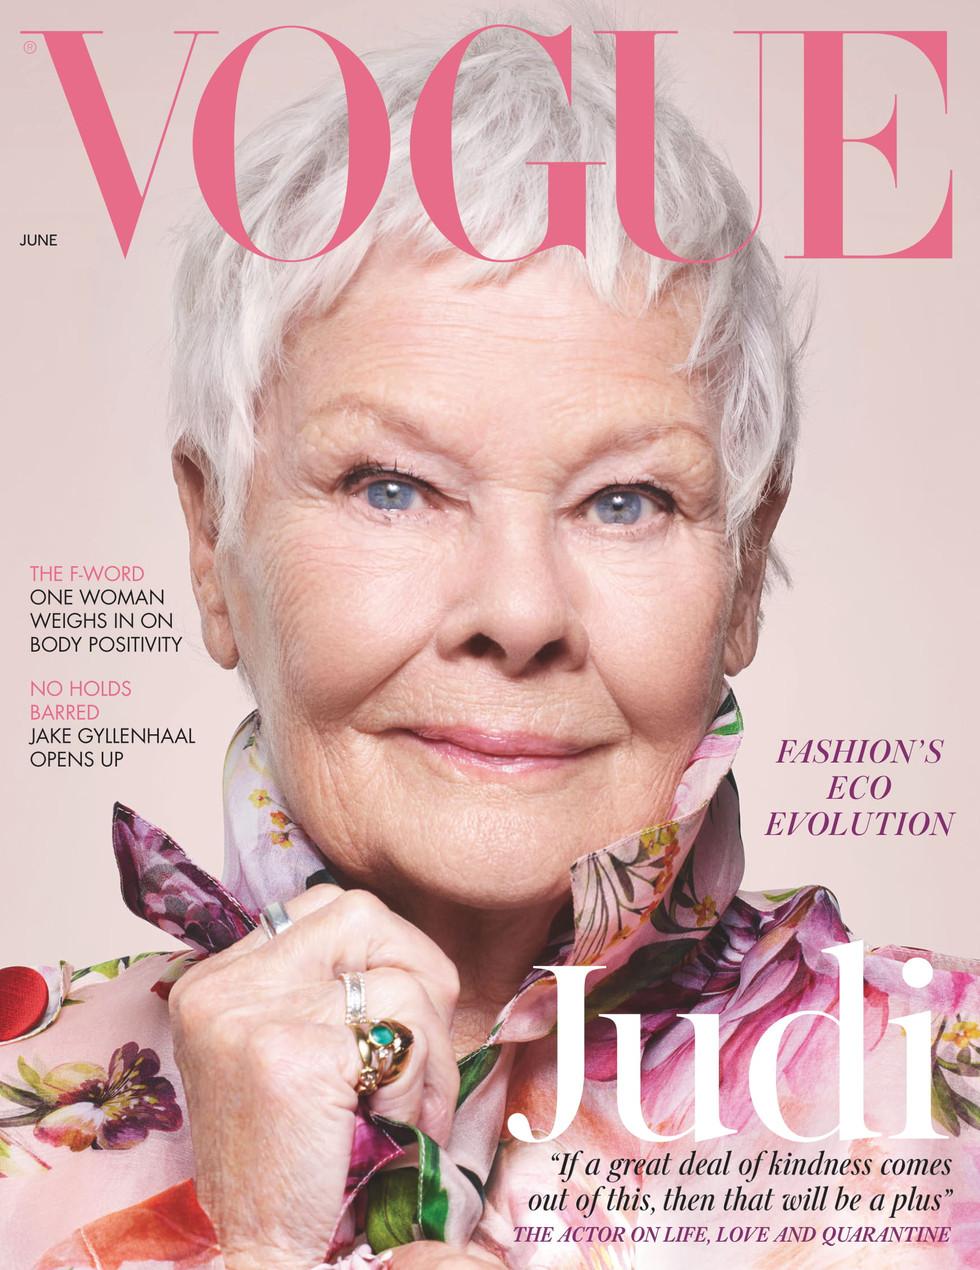 Vogue_Cover_June (1)-1.jpg